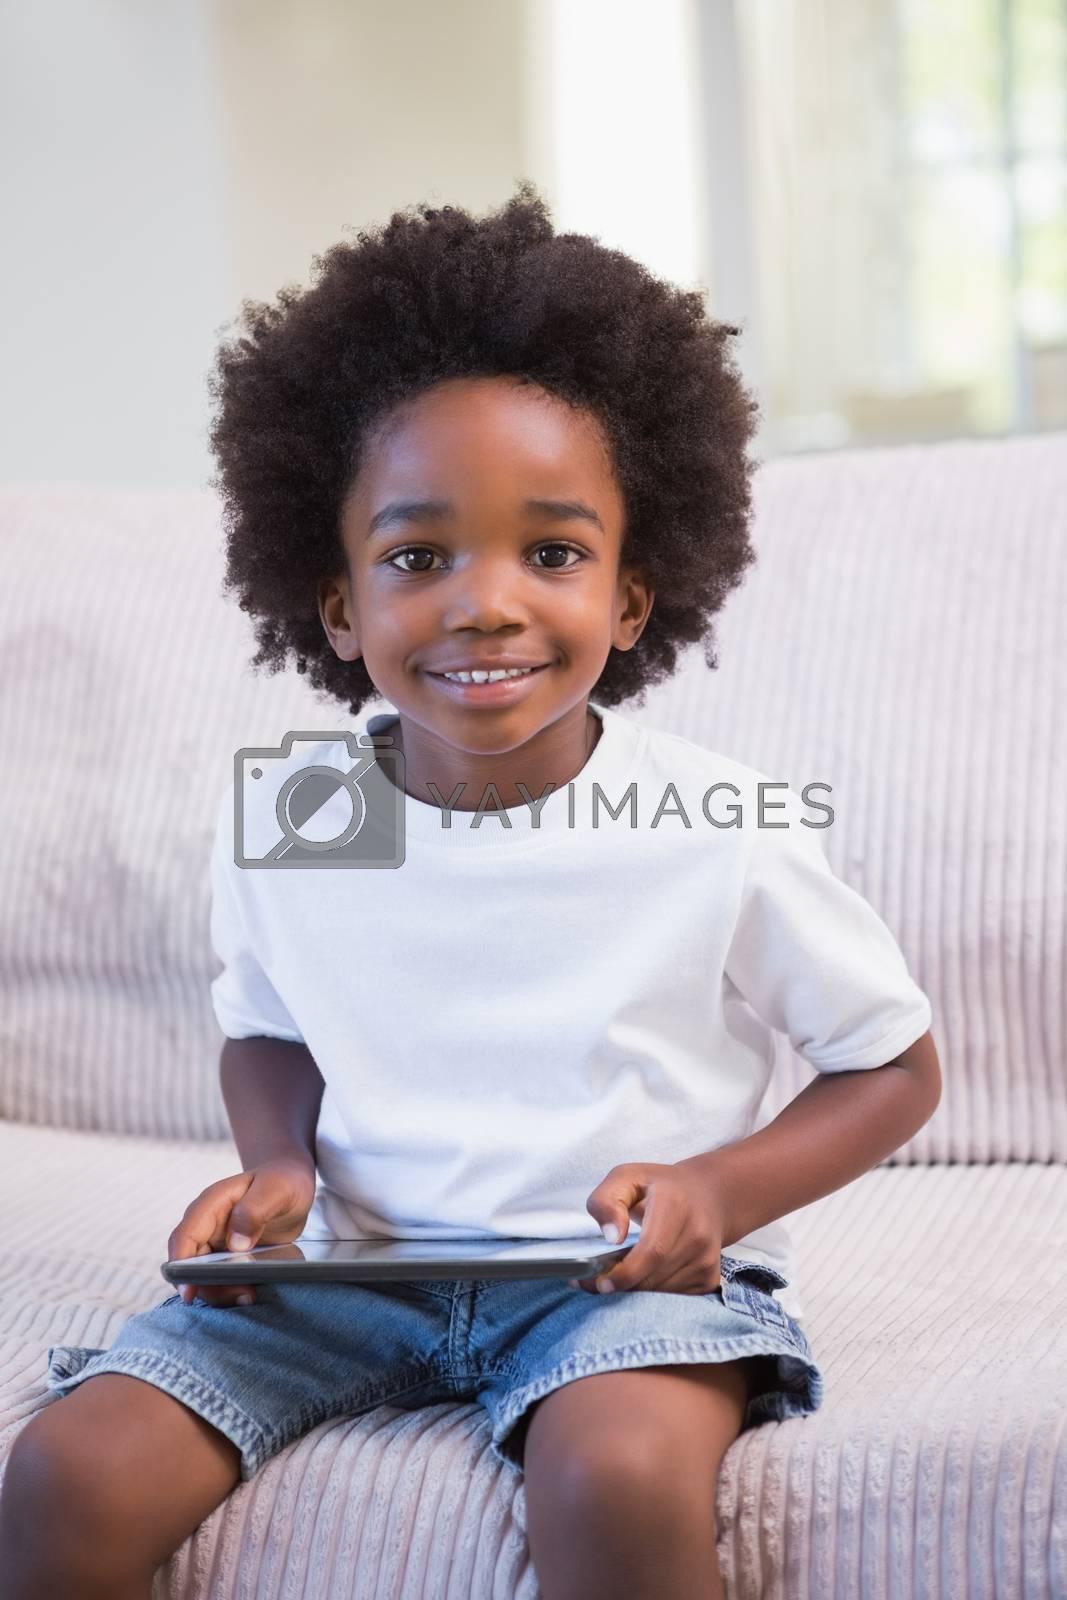 Royalty free image of Portrait of a little boy using digital tablet  by Wavebreakmedia